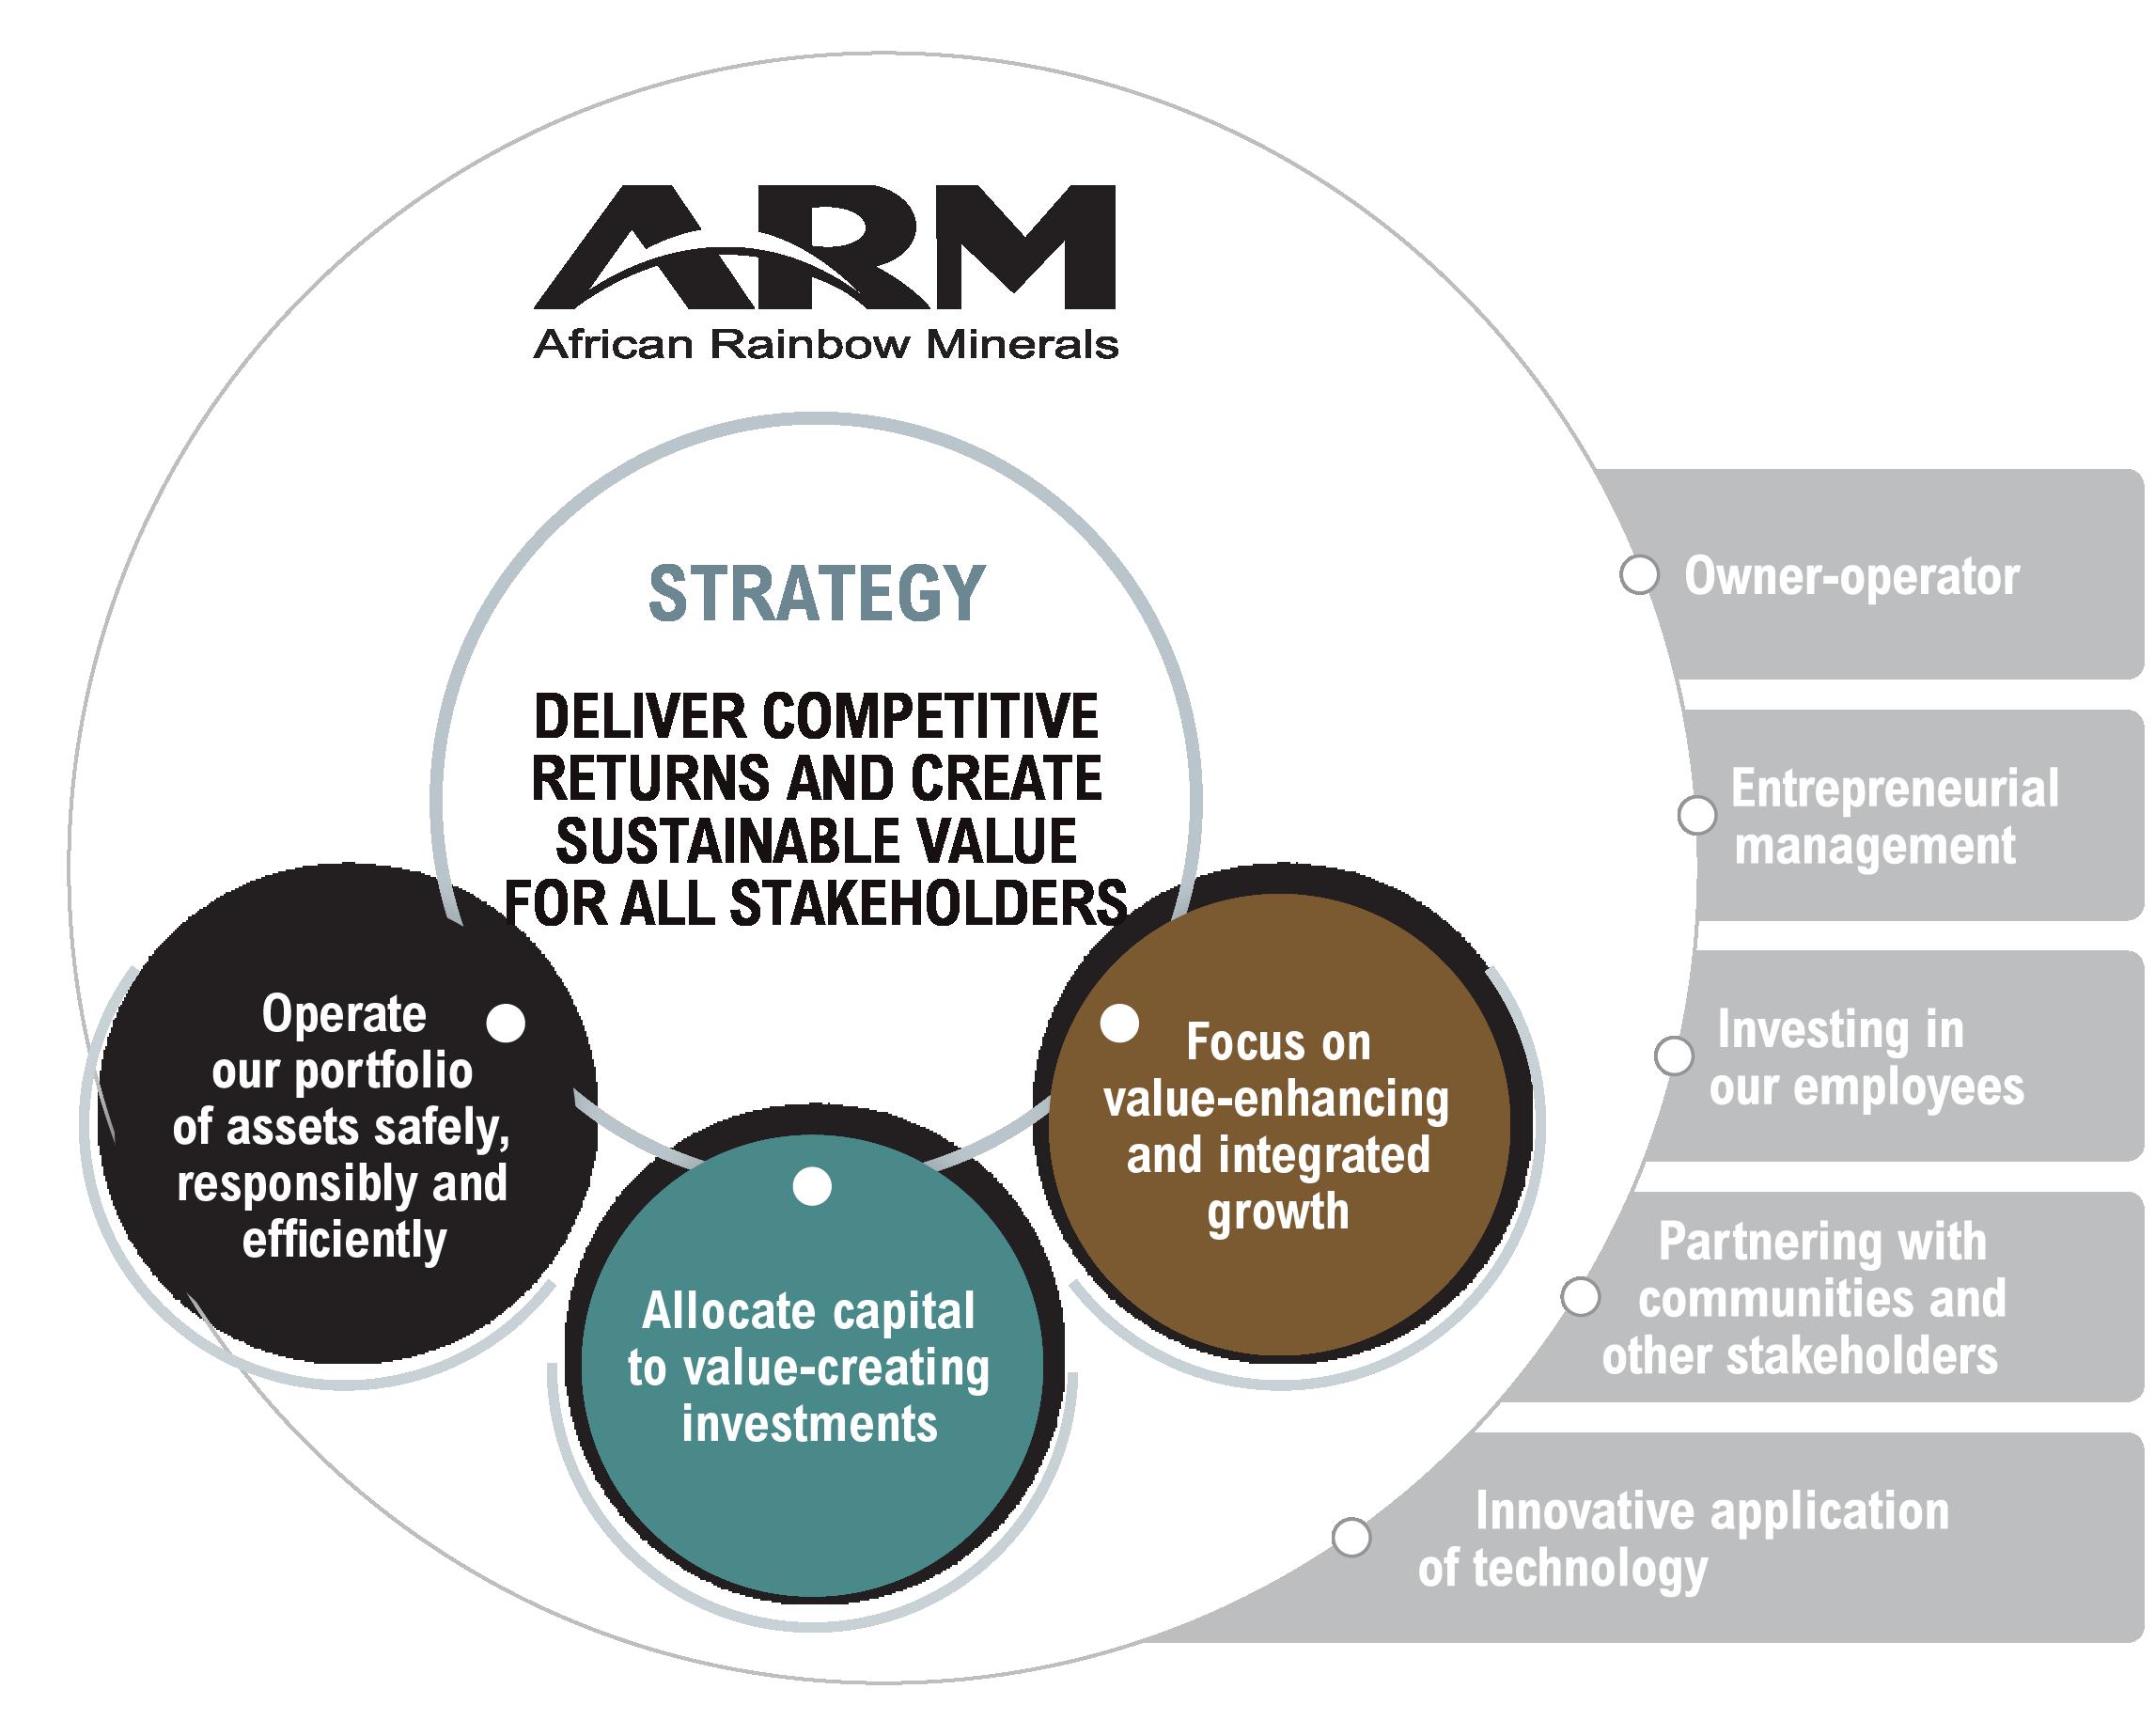 ARM strategy